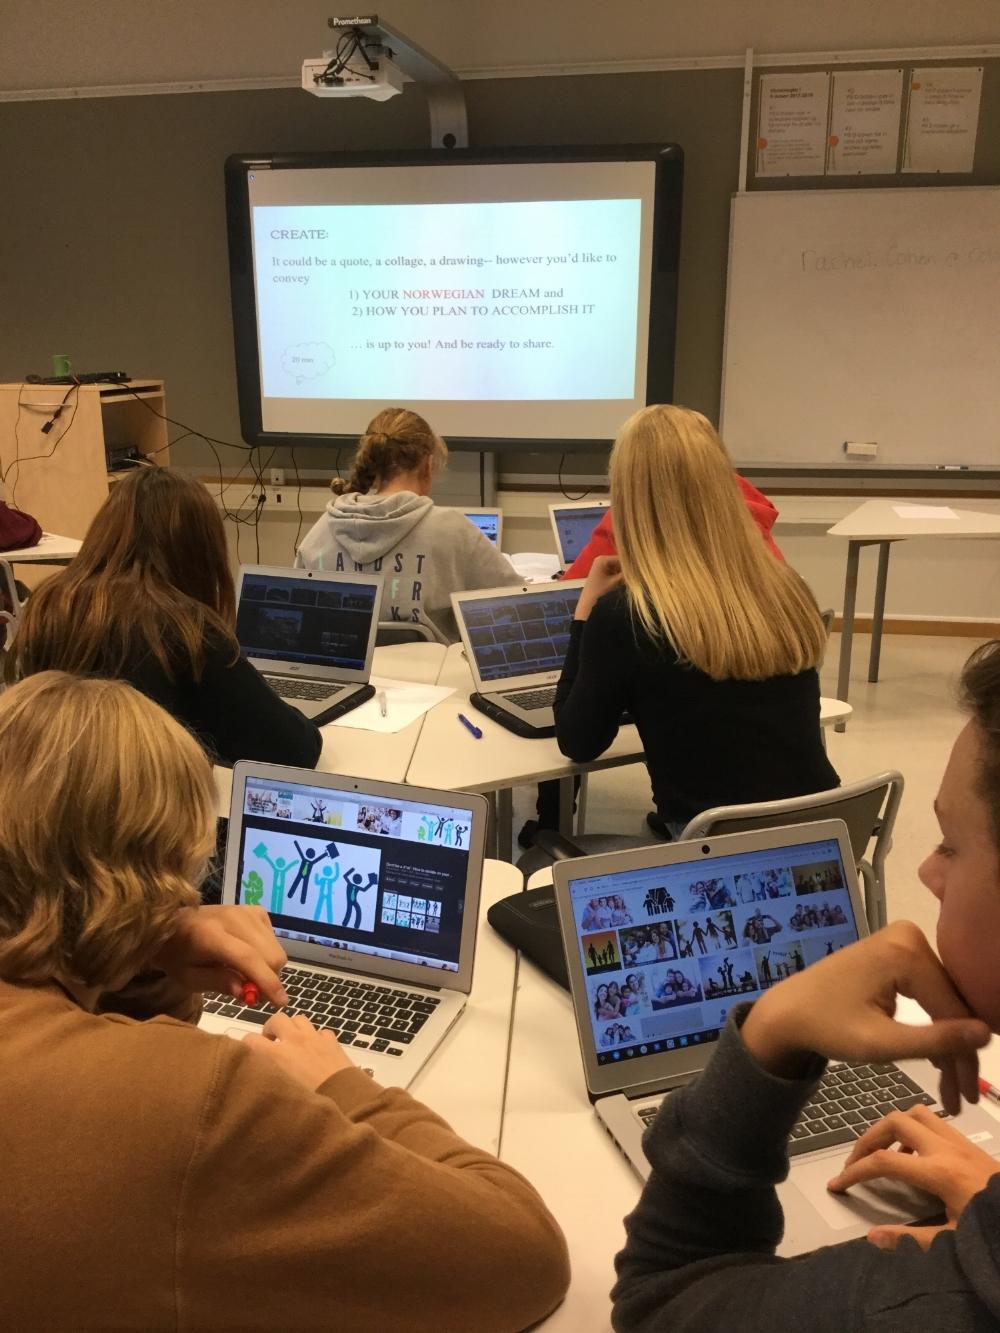 Creating Dream collages. Flatestad skole, Oppegard.